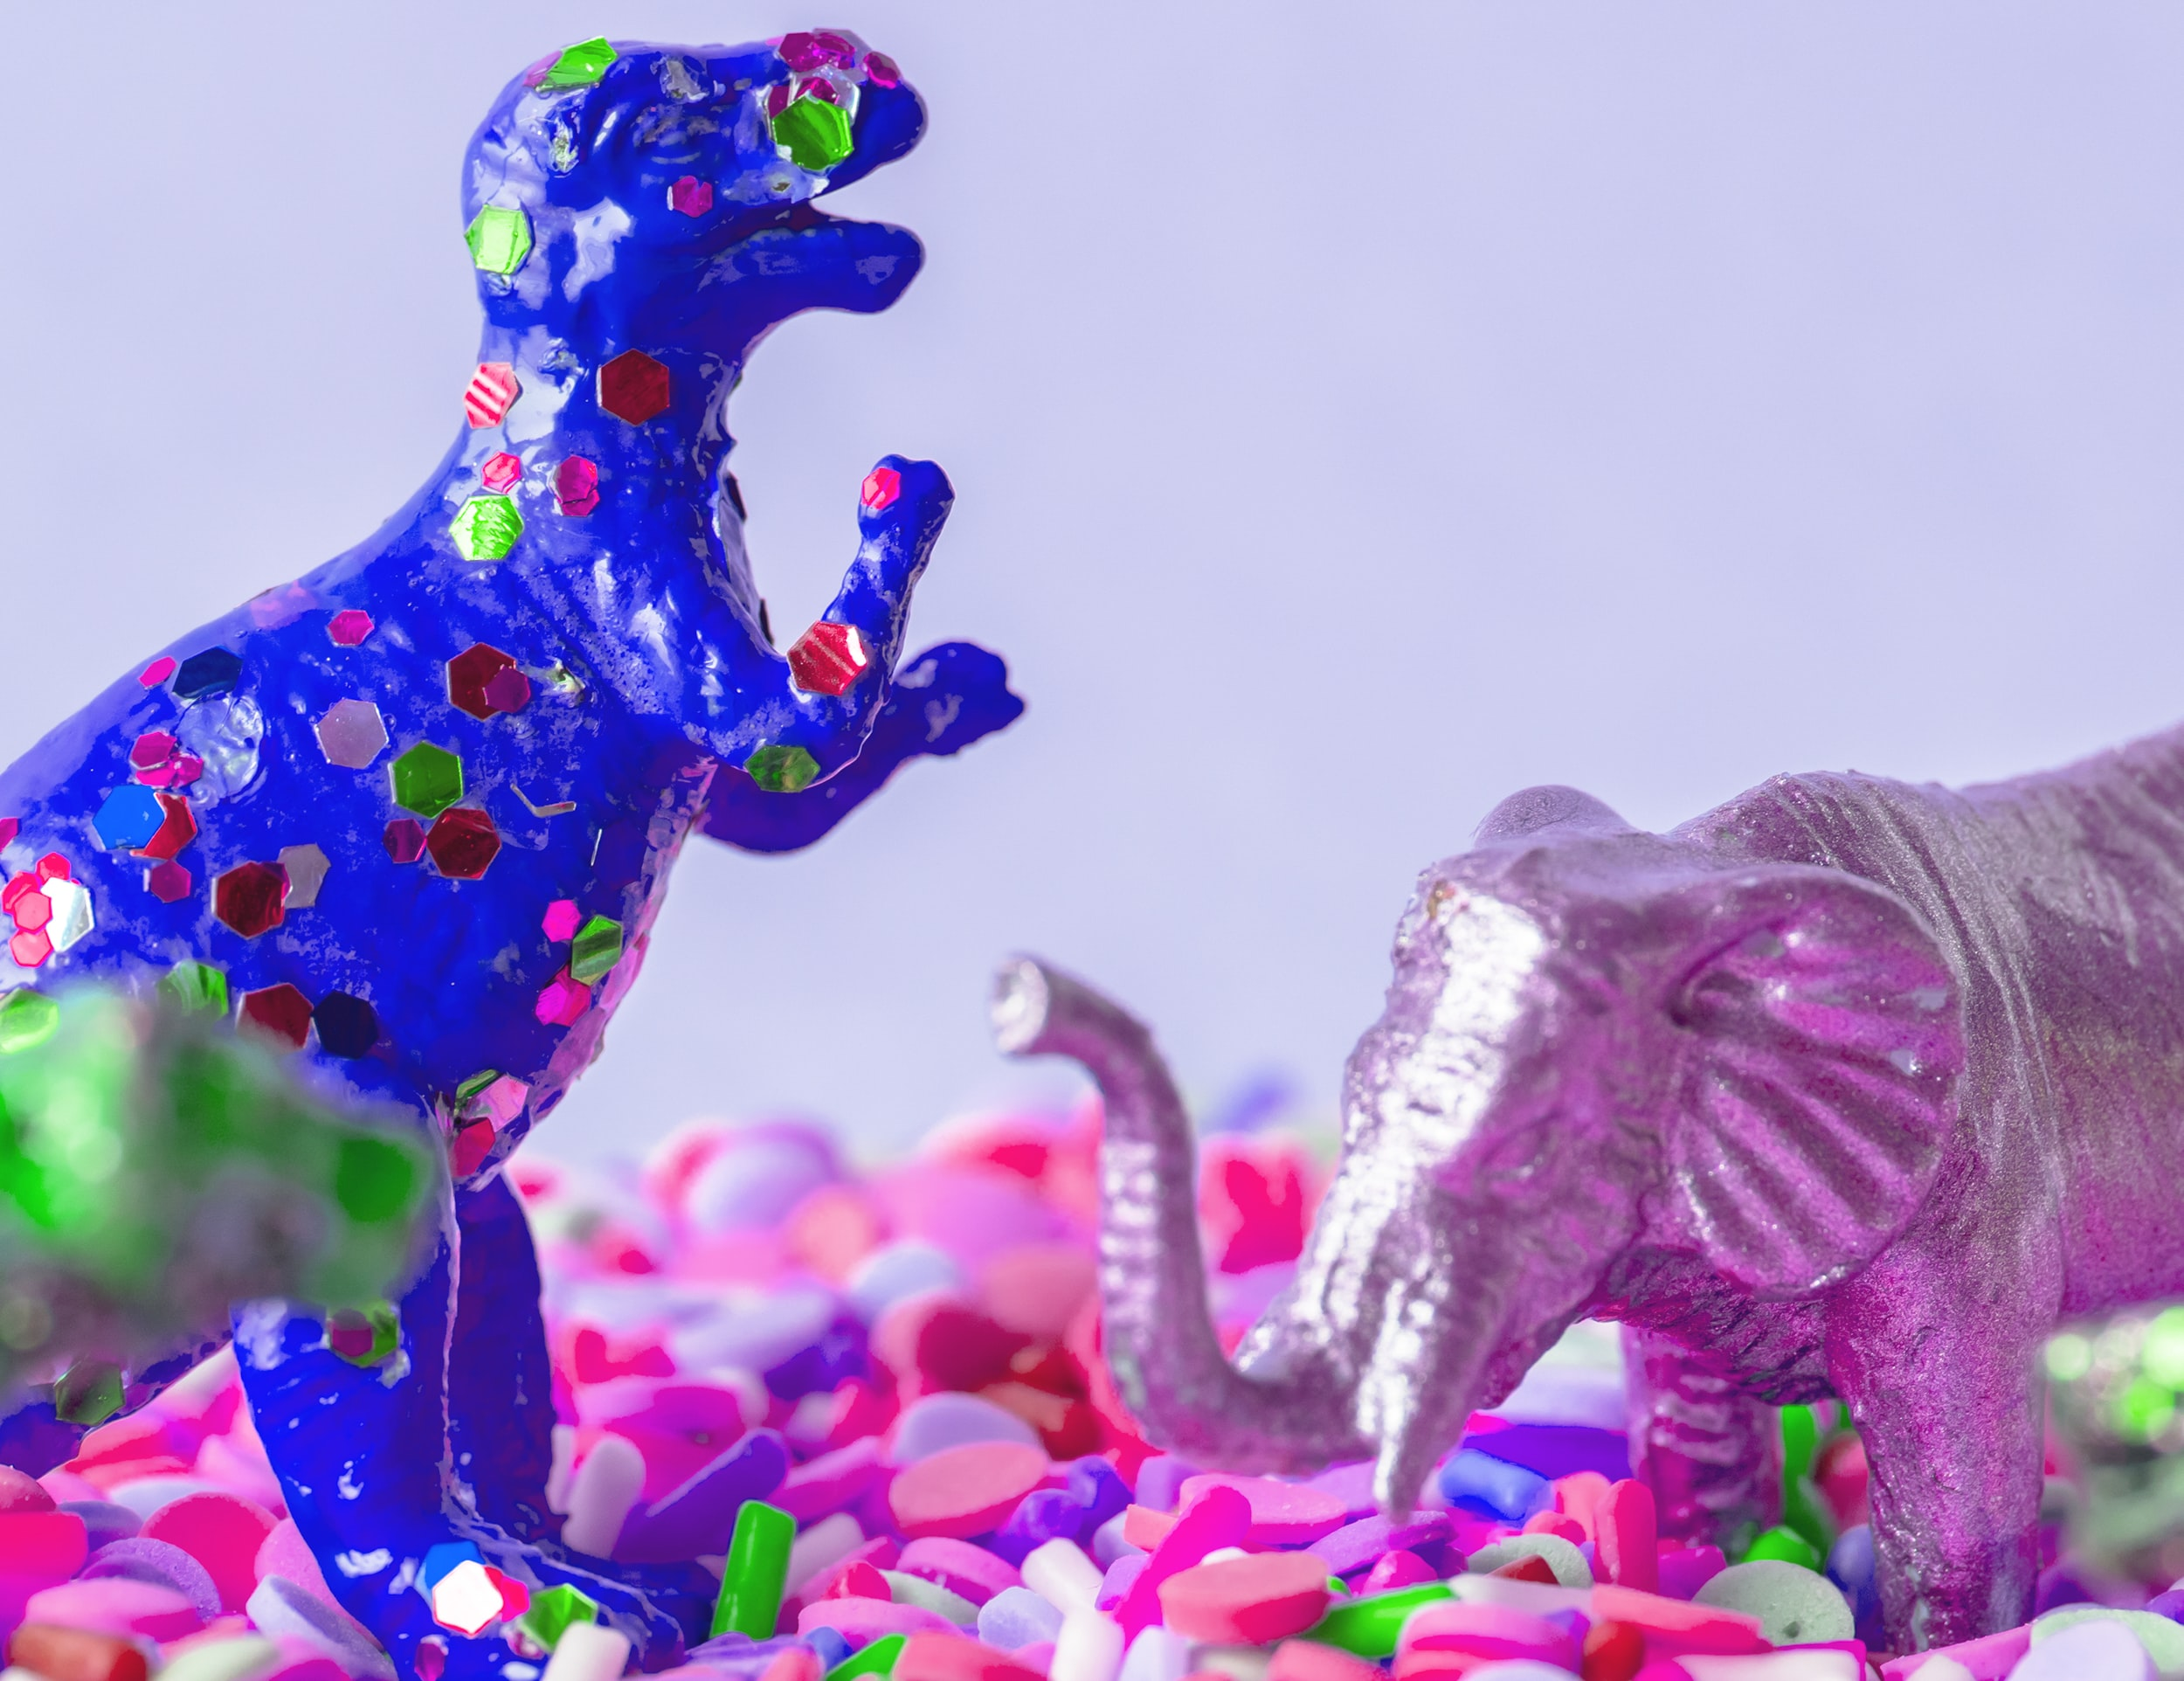 blue dinosaur and silver elephant figurines